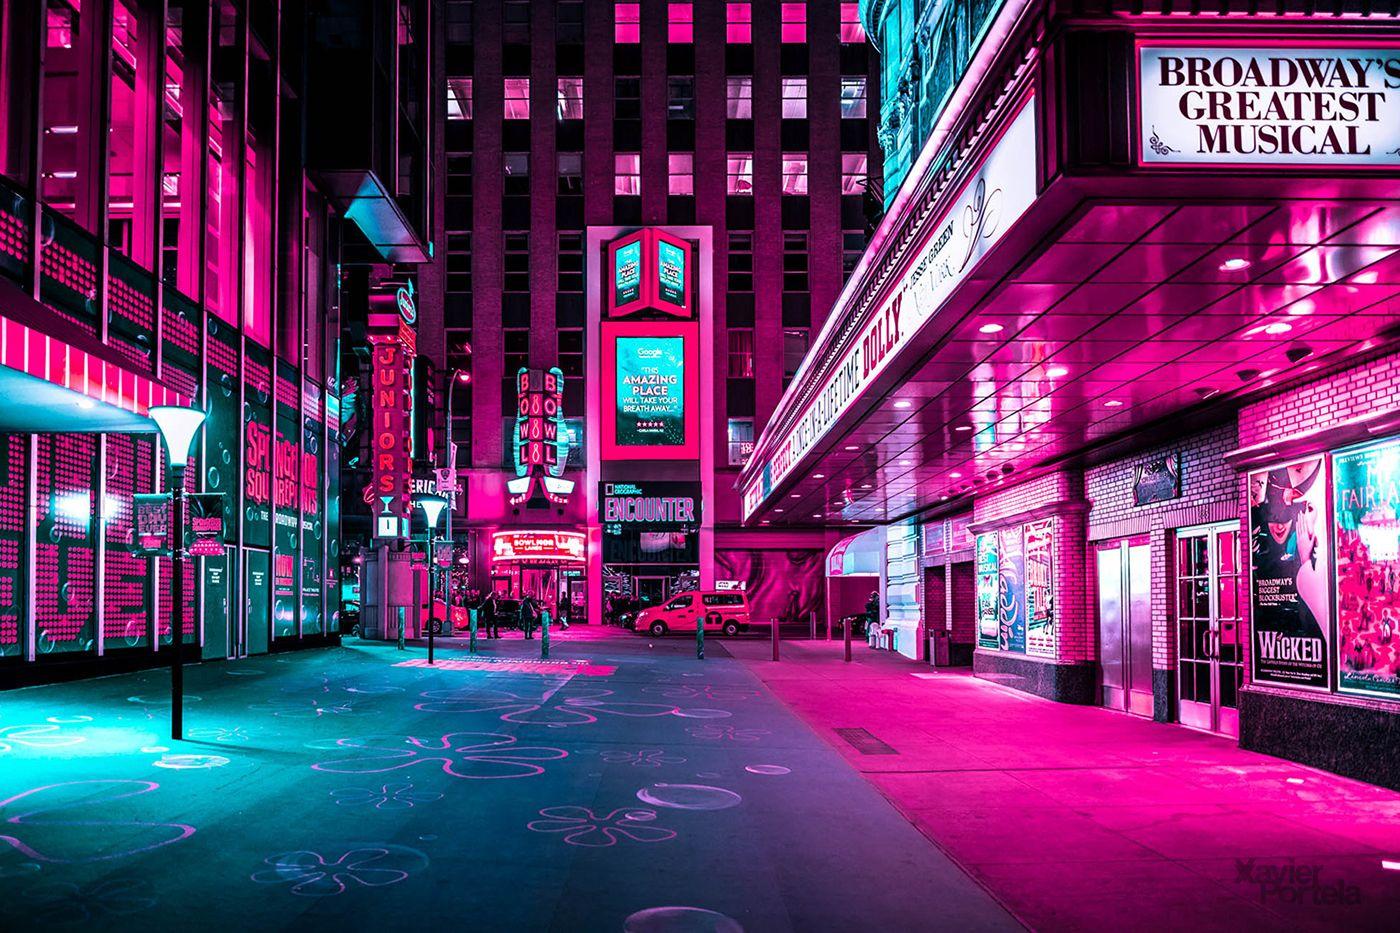 New York Under The Lens Of Xavier Portela Neon Photography Aesthetic Desktop Wallpaper Neon Backgrounds